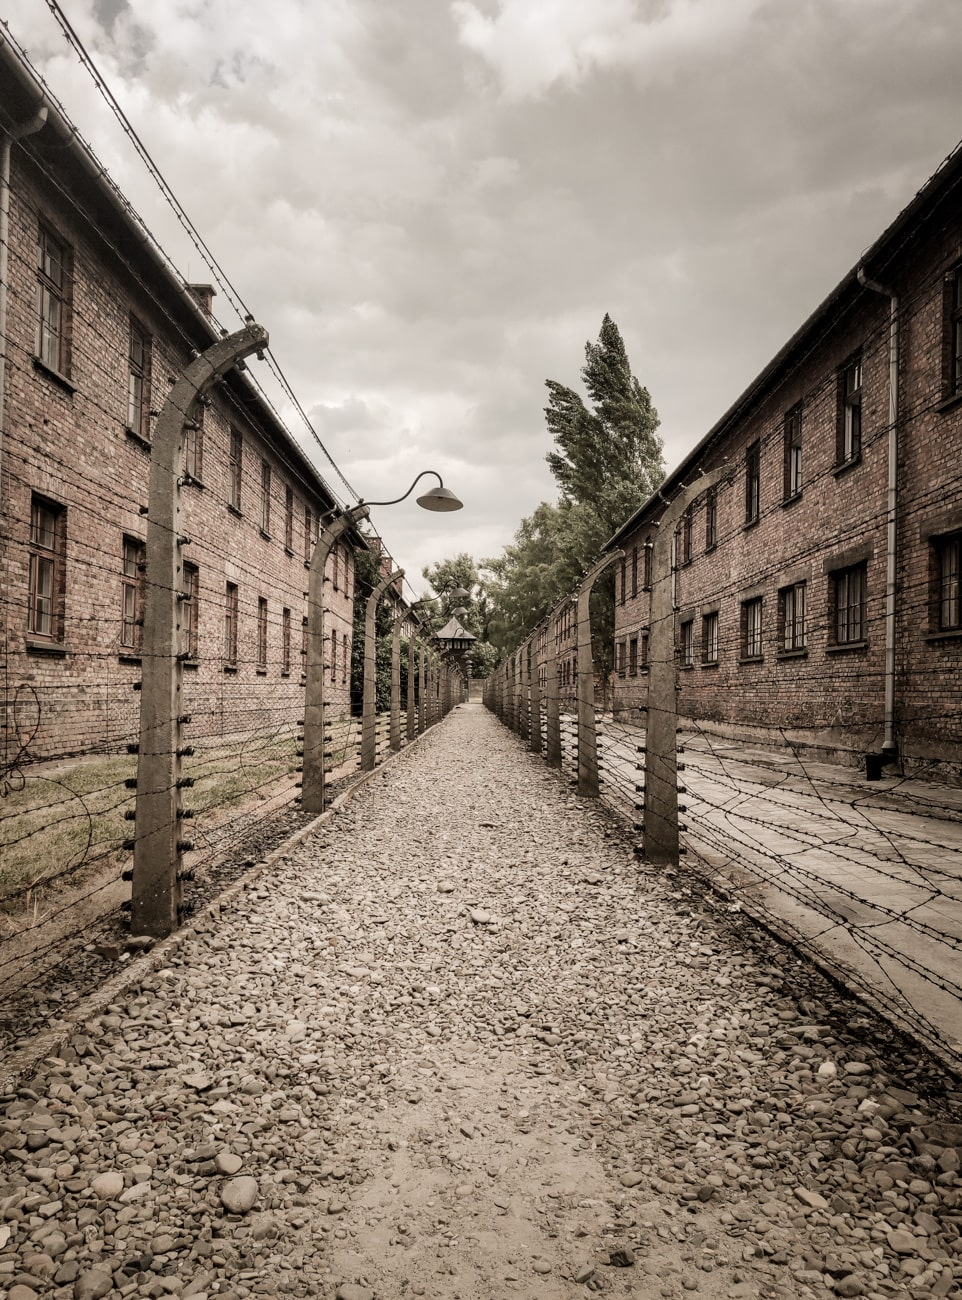 Buildings & Fences in Auschwitz